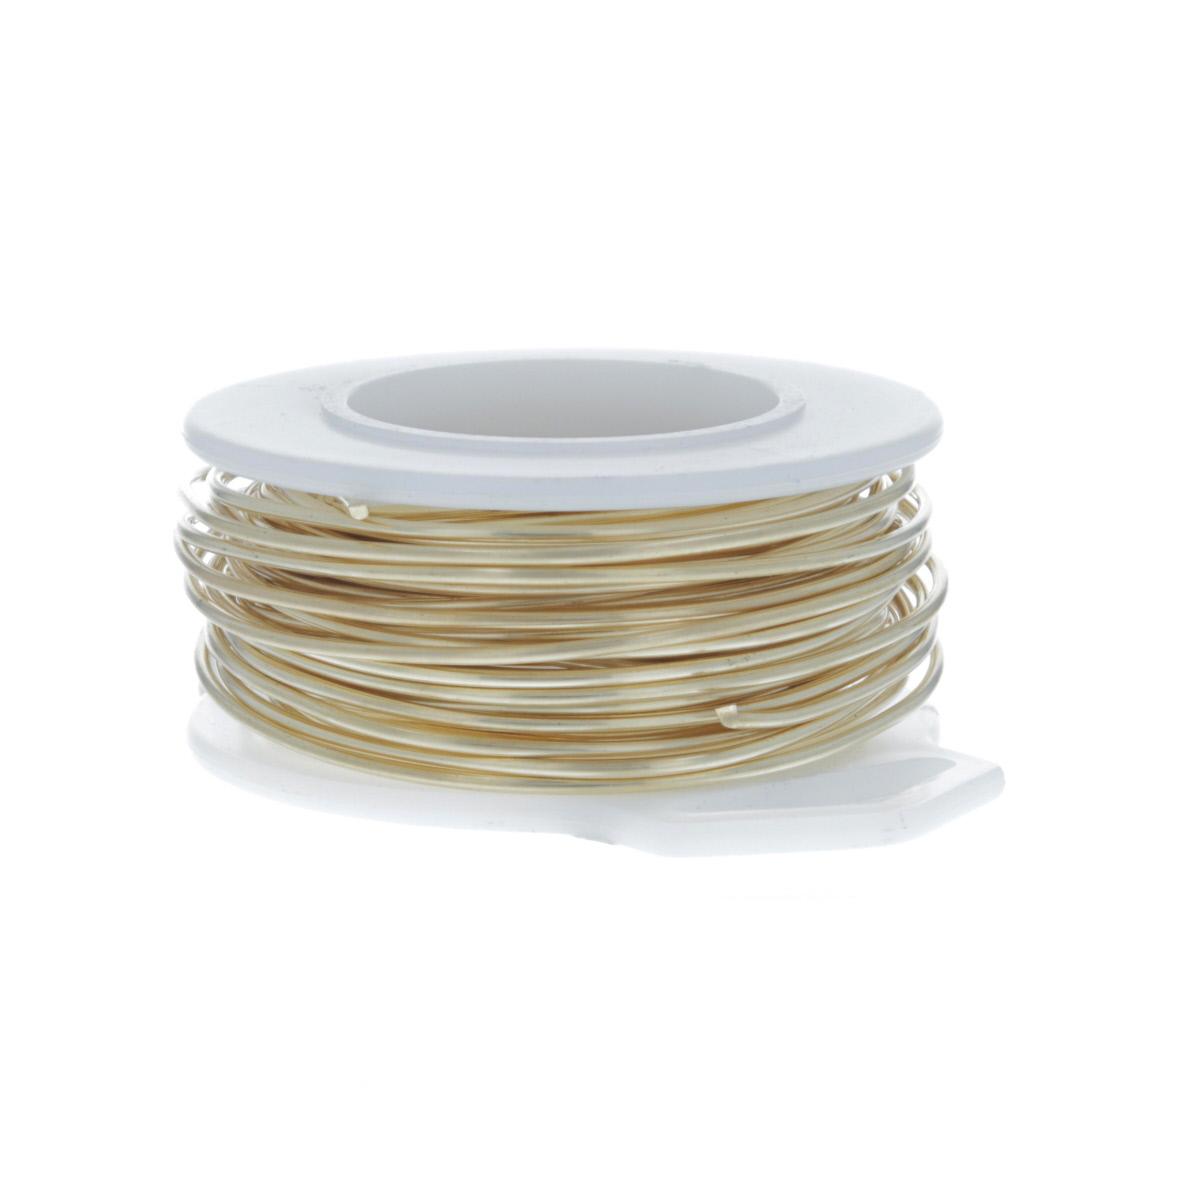 12 Gauge Round Gold Tone Brass Craft Wire - 5 ft: Wire Jewelry ...